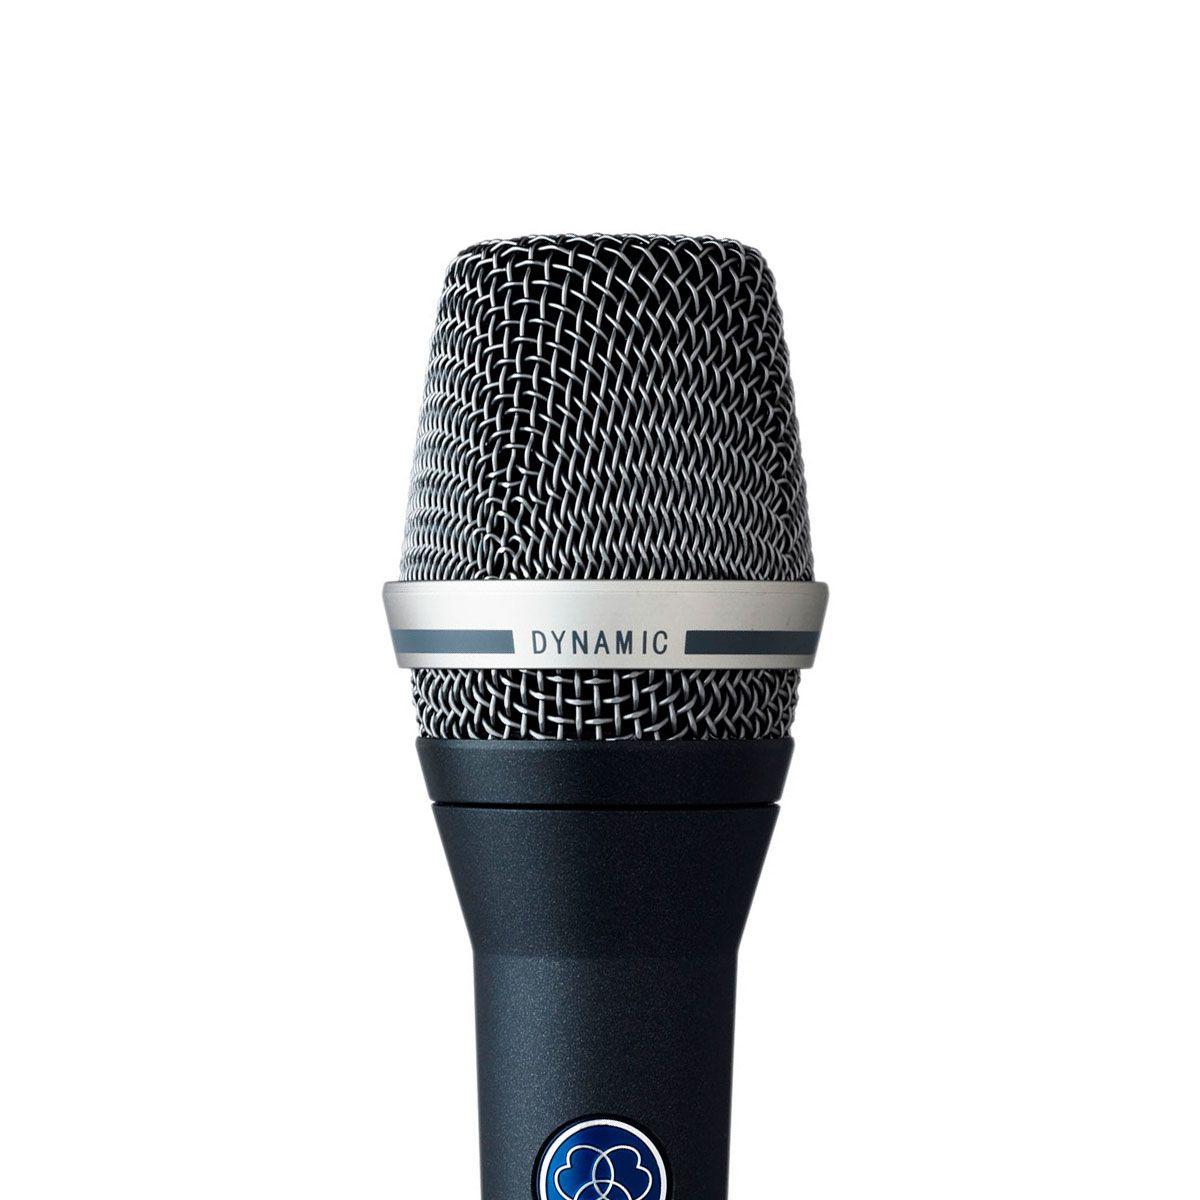 MICROFONE DE FIO D7 VOCAL AKG